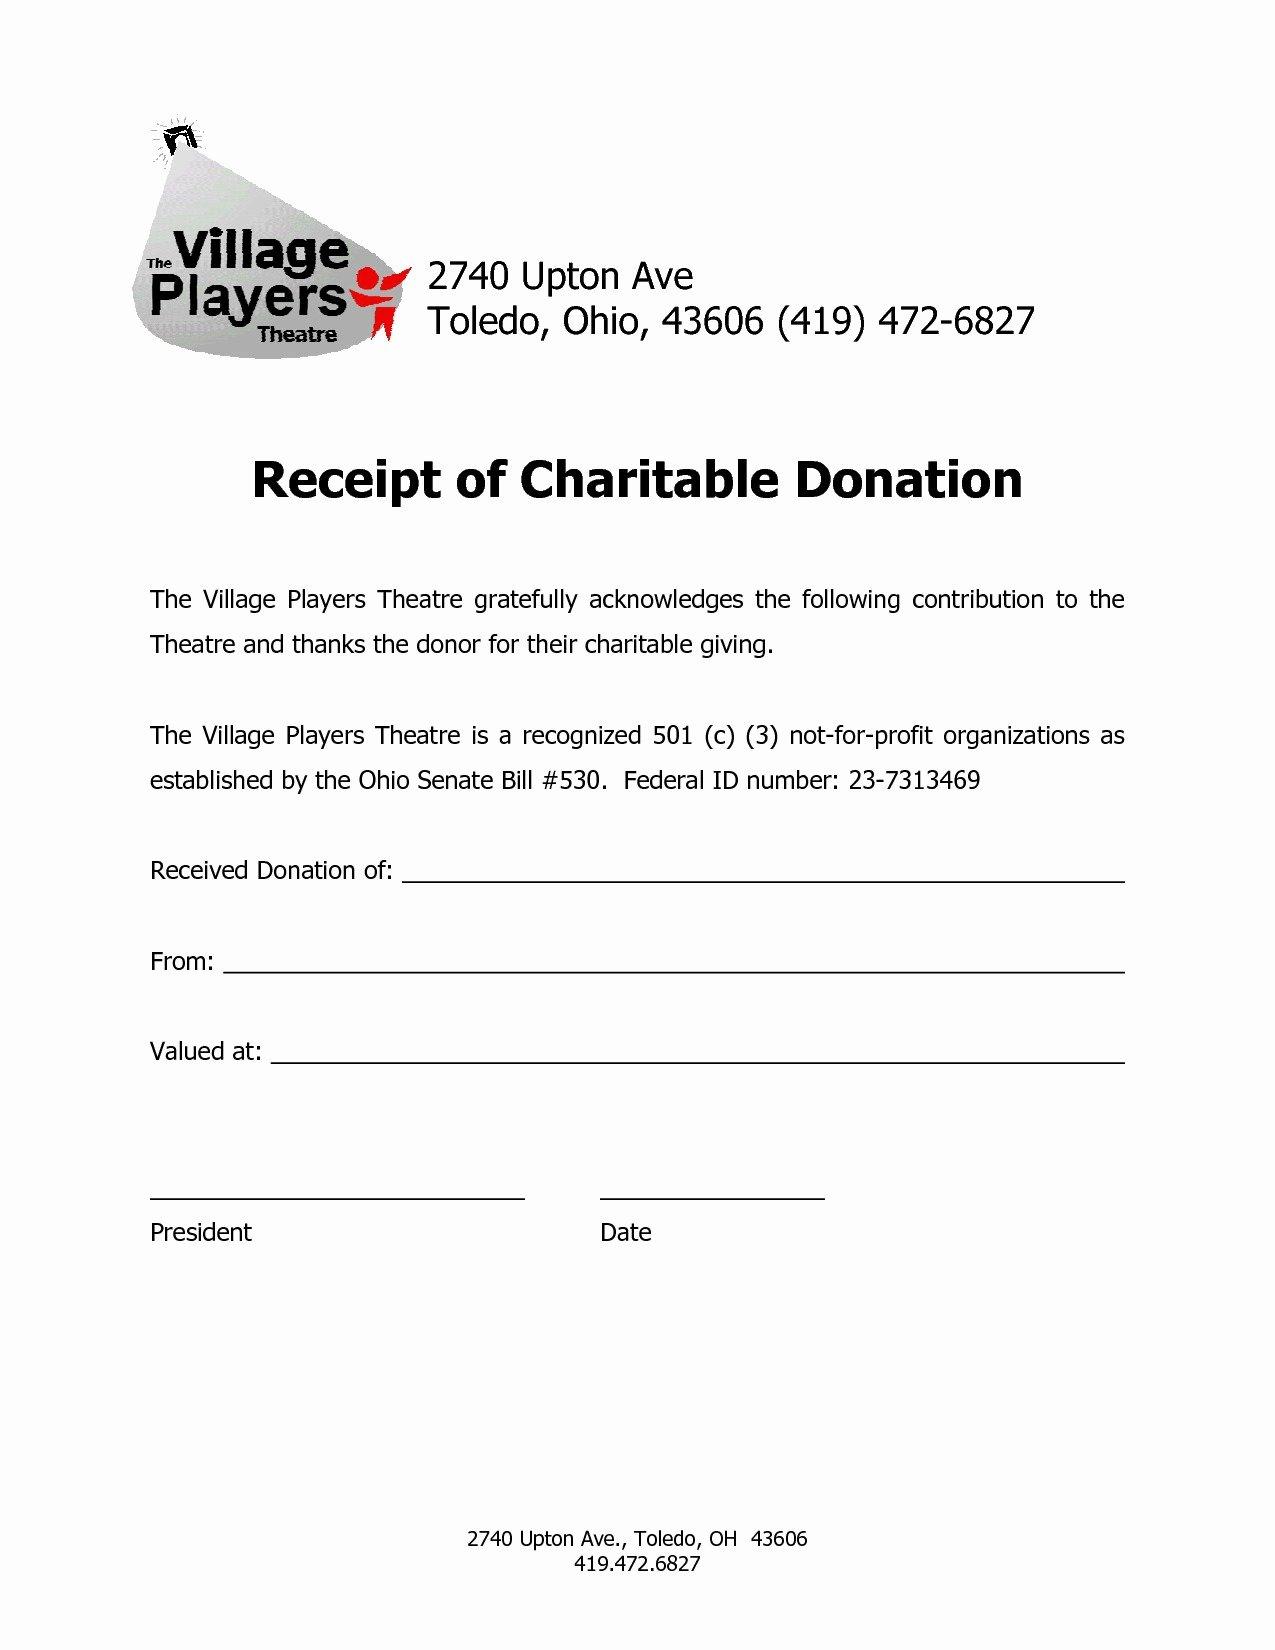 Nonprofit Donation Receipt Template Inspirational Non Profit Tax Deduction Letter Template Collection